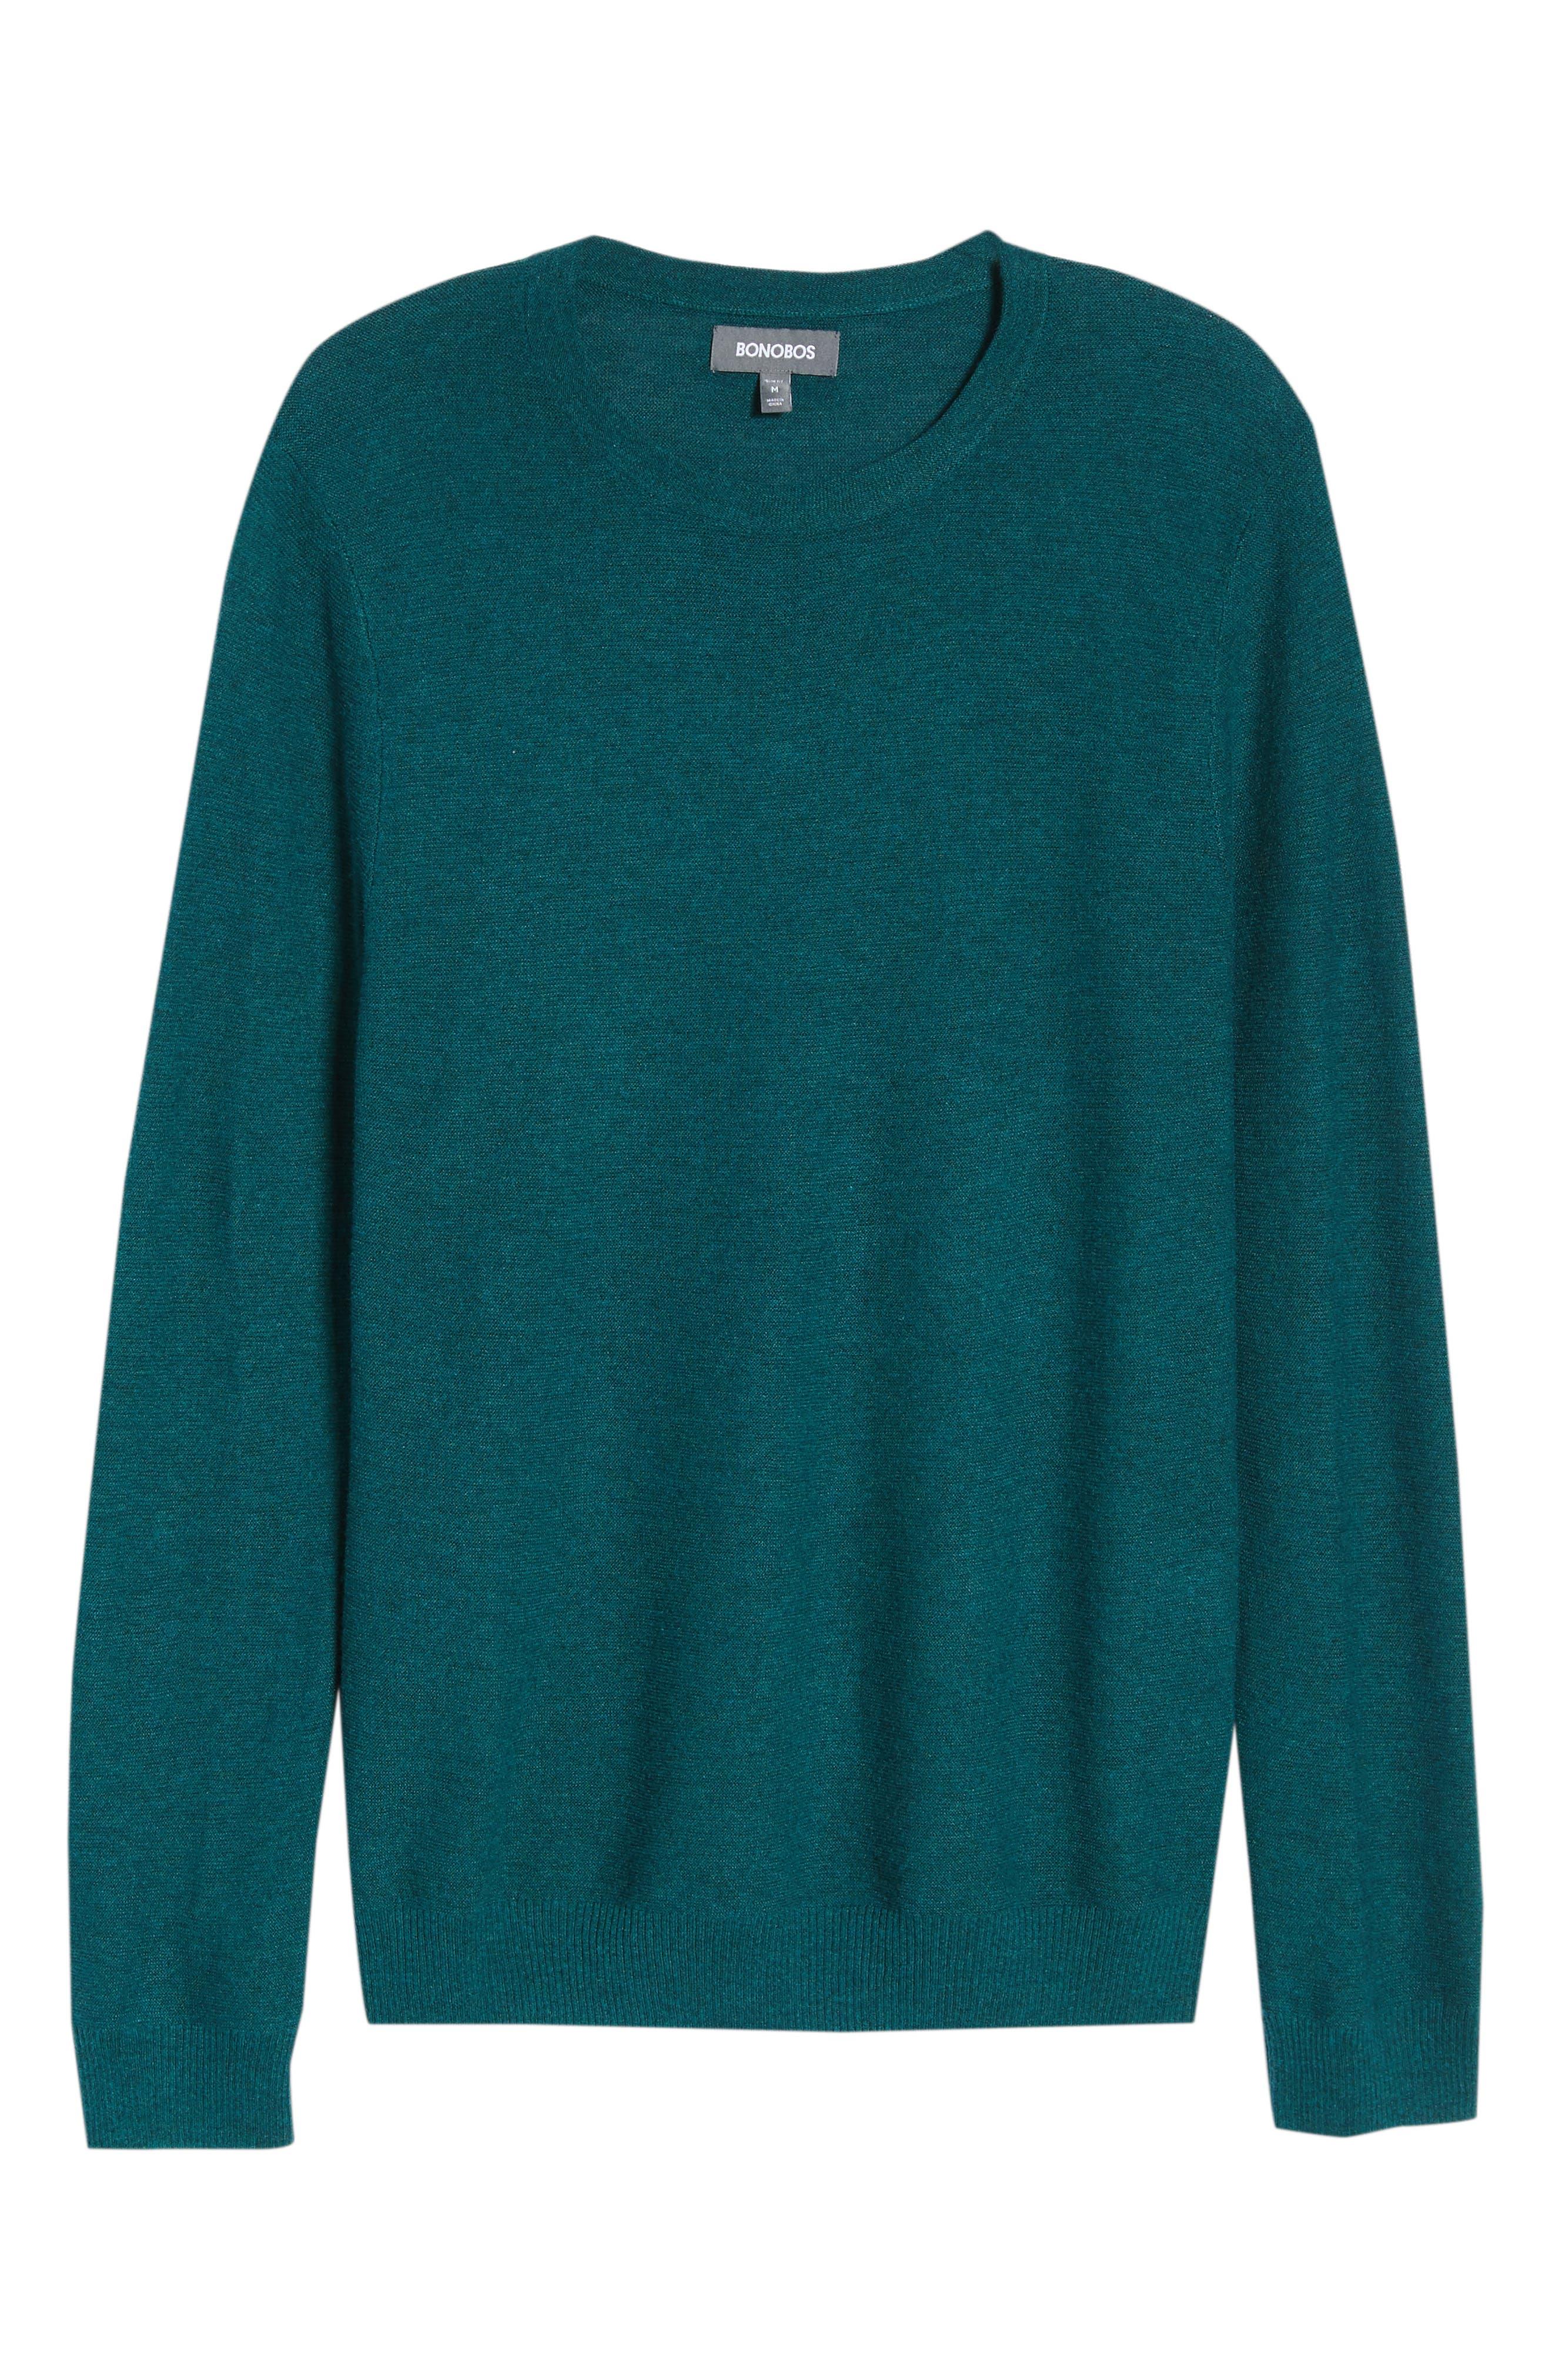 Slim Fit Crewneck Sweater,                             Alternate thumbnail 6, color,                             Heather Peacock